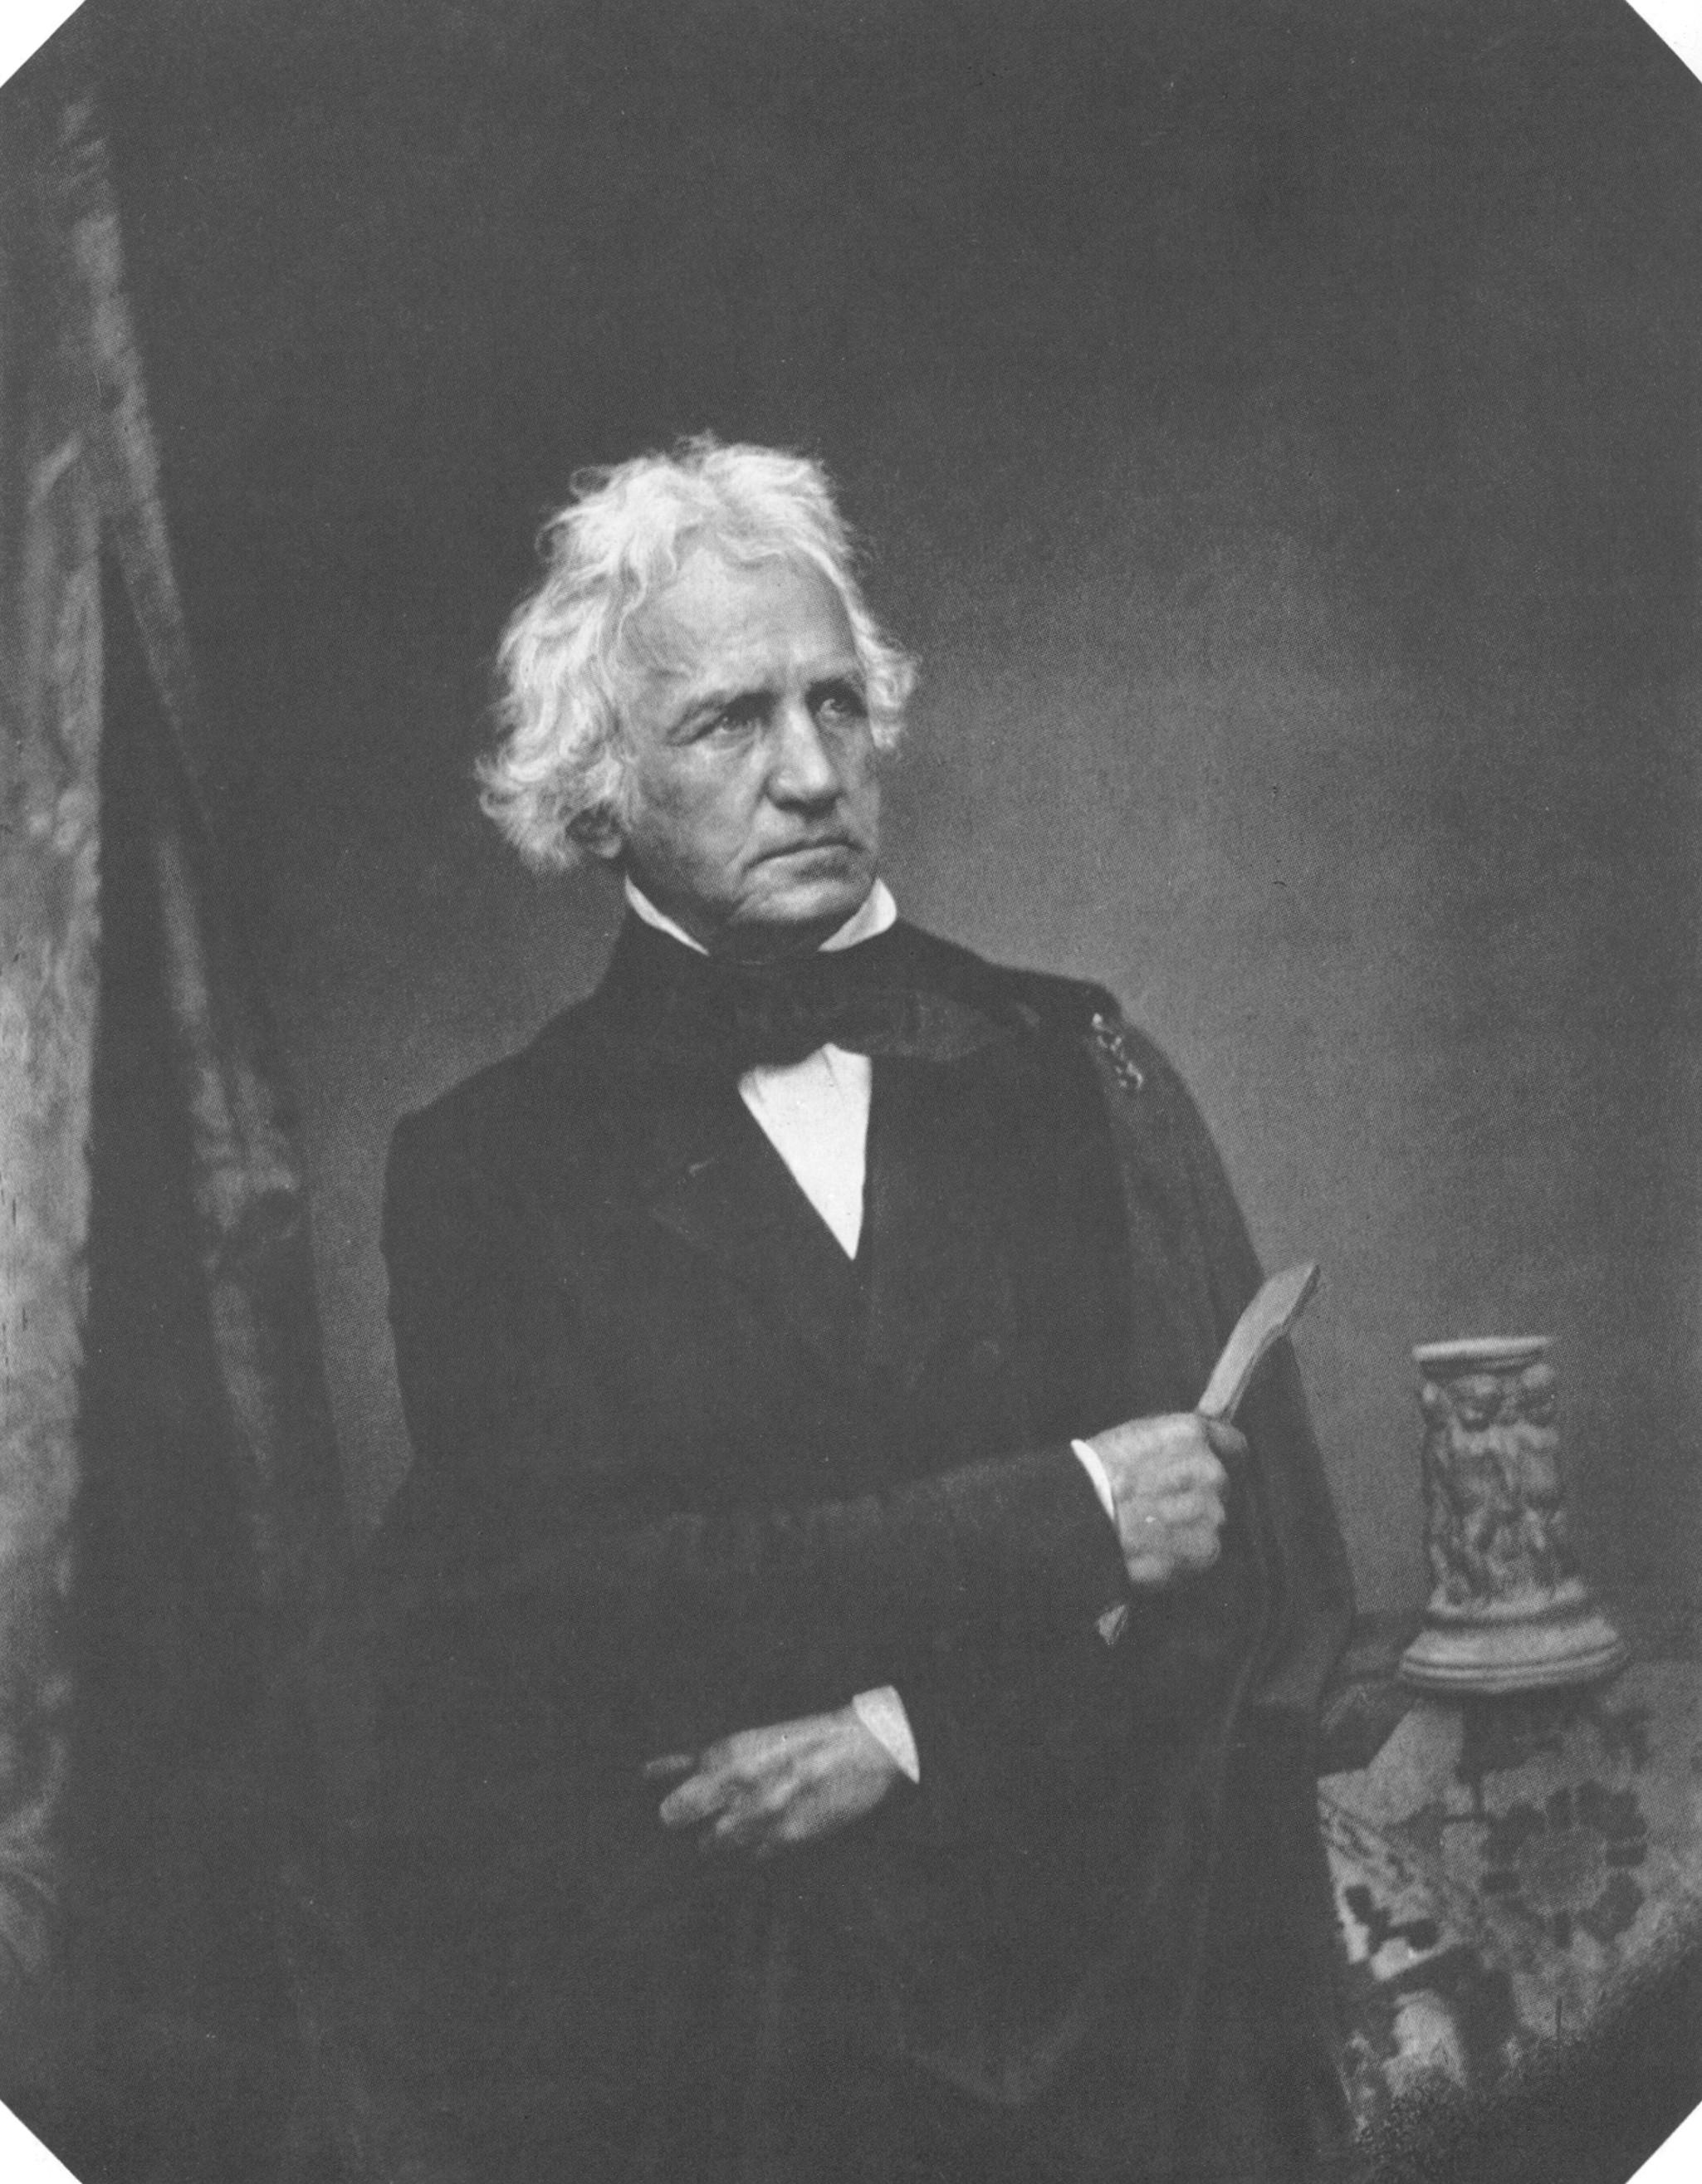 Photograph of Christian Daniel Rauch, 1855